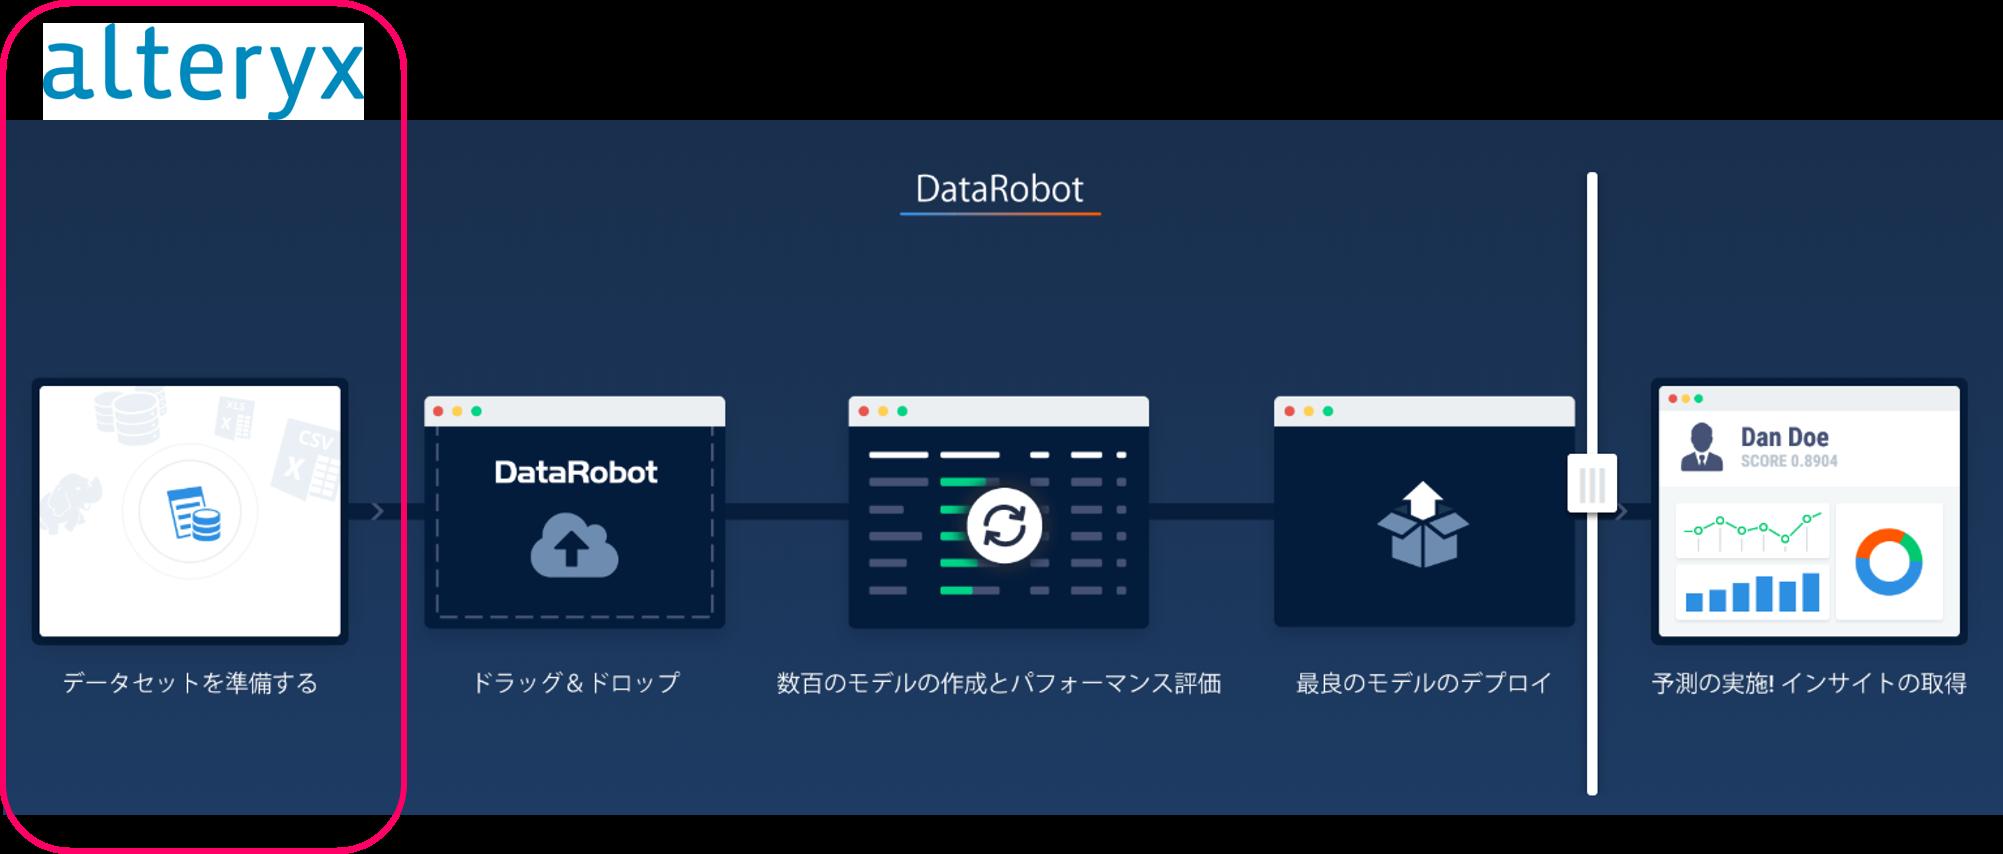 Alteryx DataRobot プロセス画像